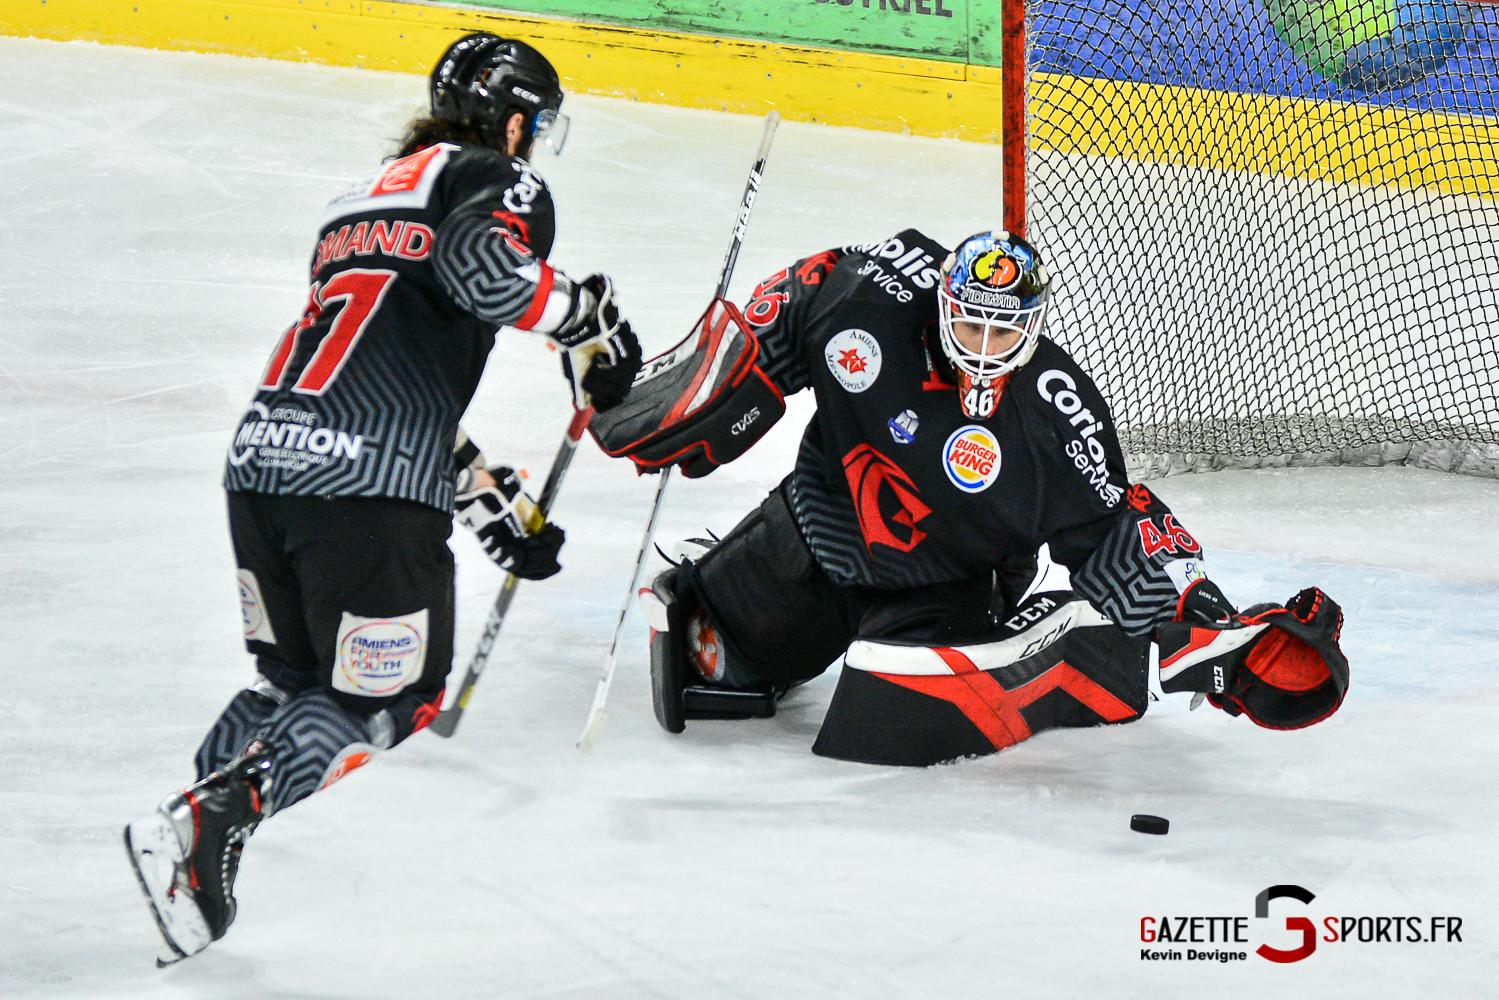 Hockey Sur Glace Amiens Vs Gap J3 Kevin Devigne Gazettesports 88